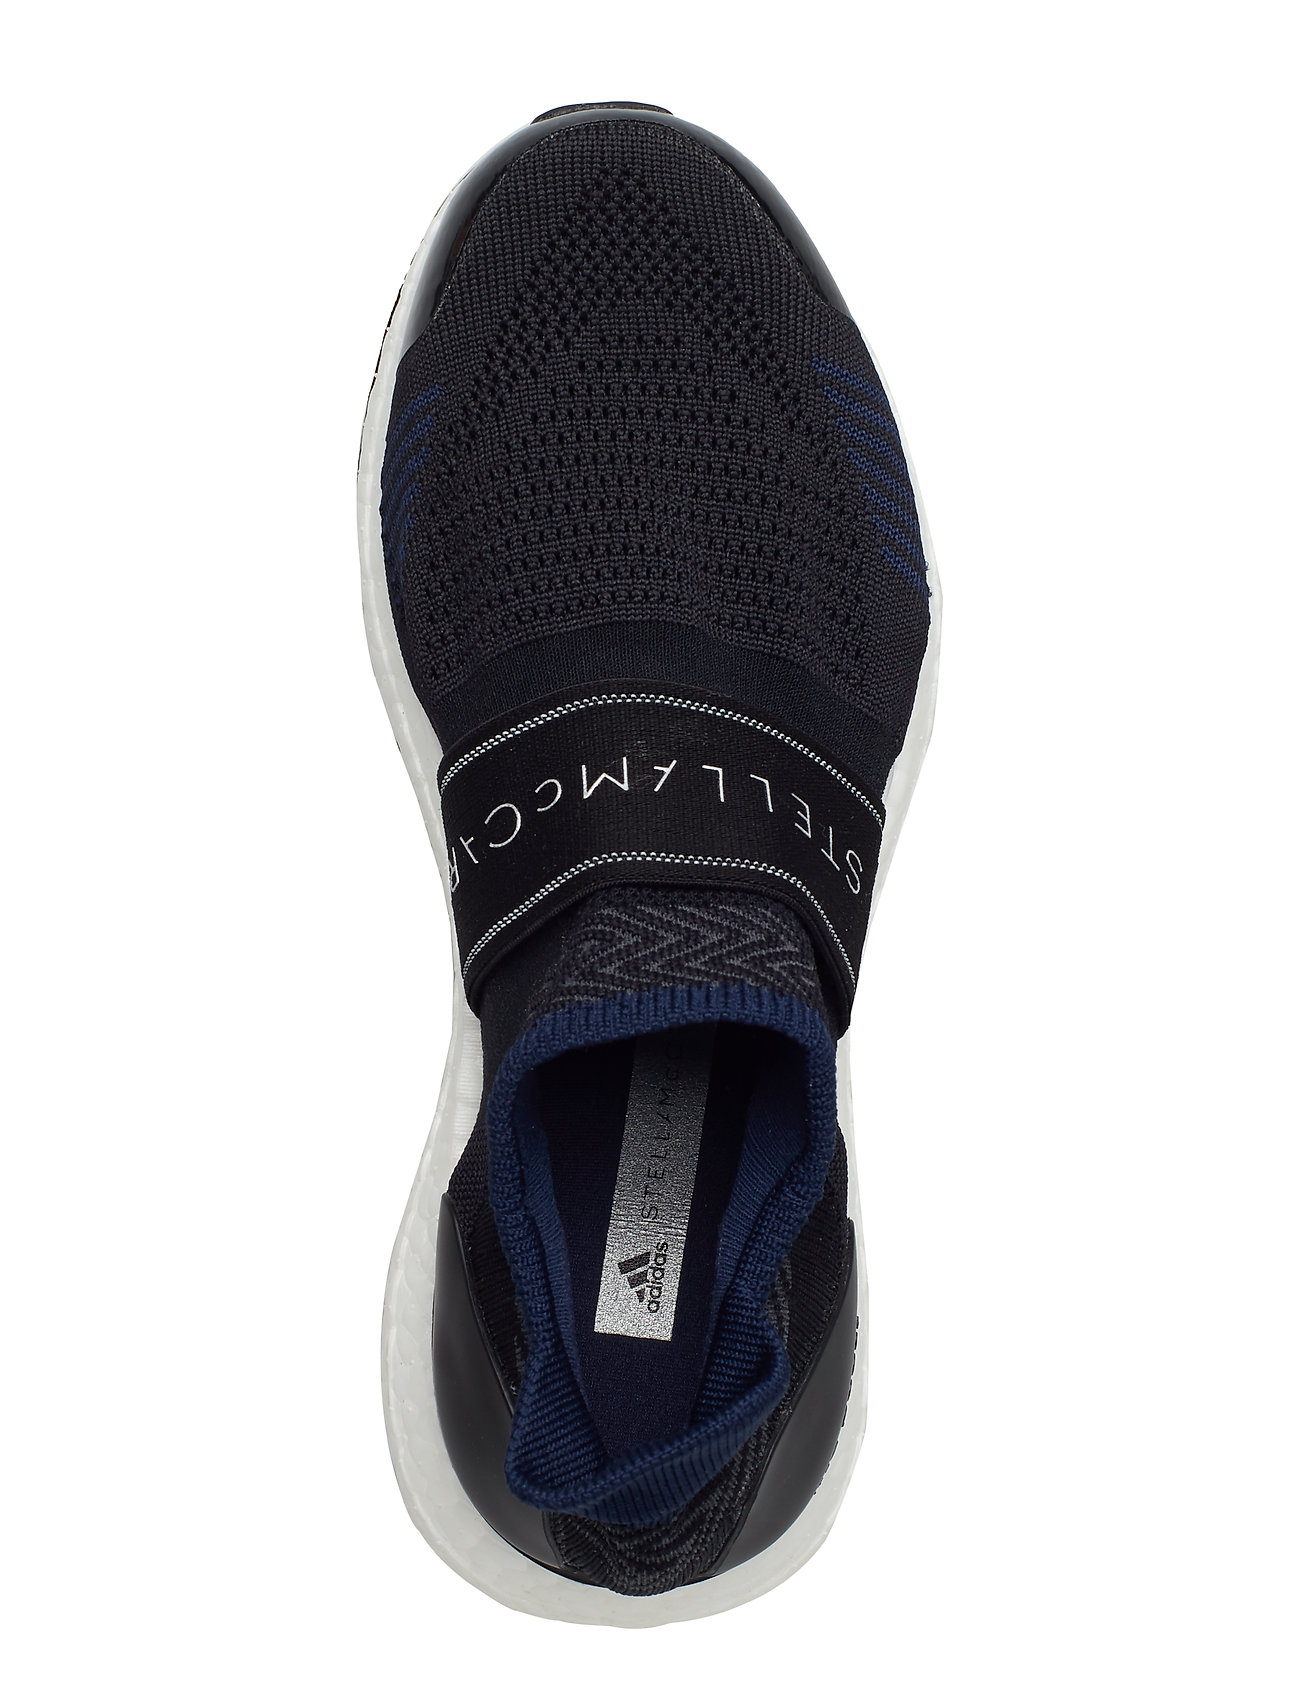 adidas by Stella McCartney - Ultraboost X 3D W - training shoes - cblack/cblack/cblack - 3